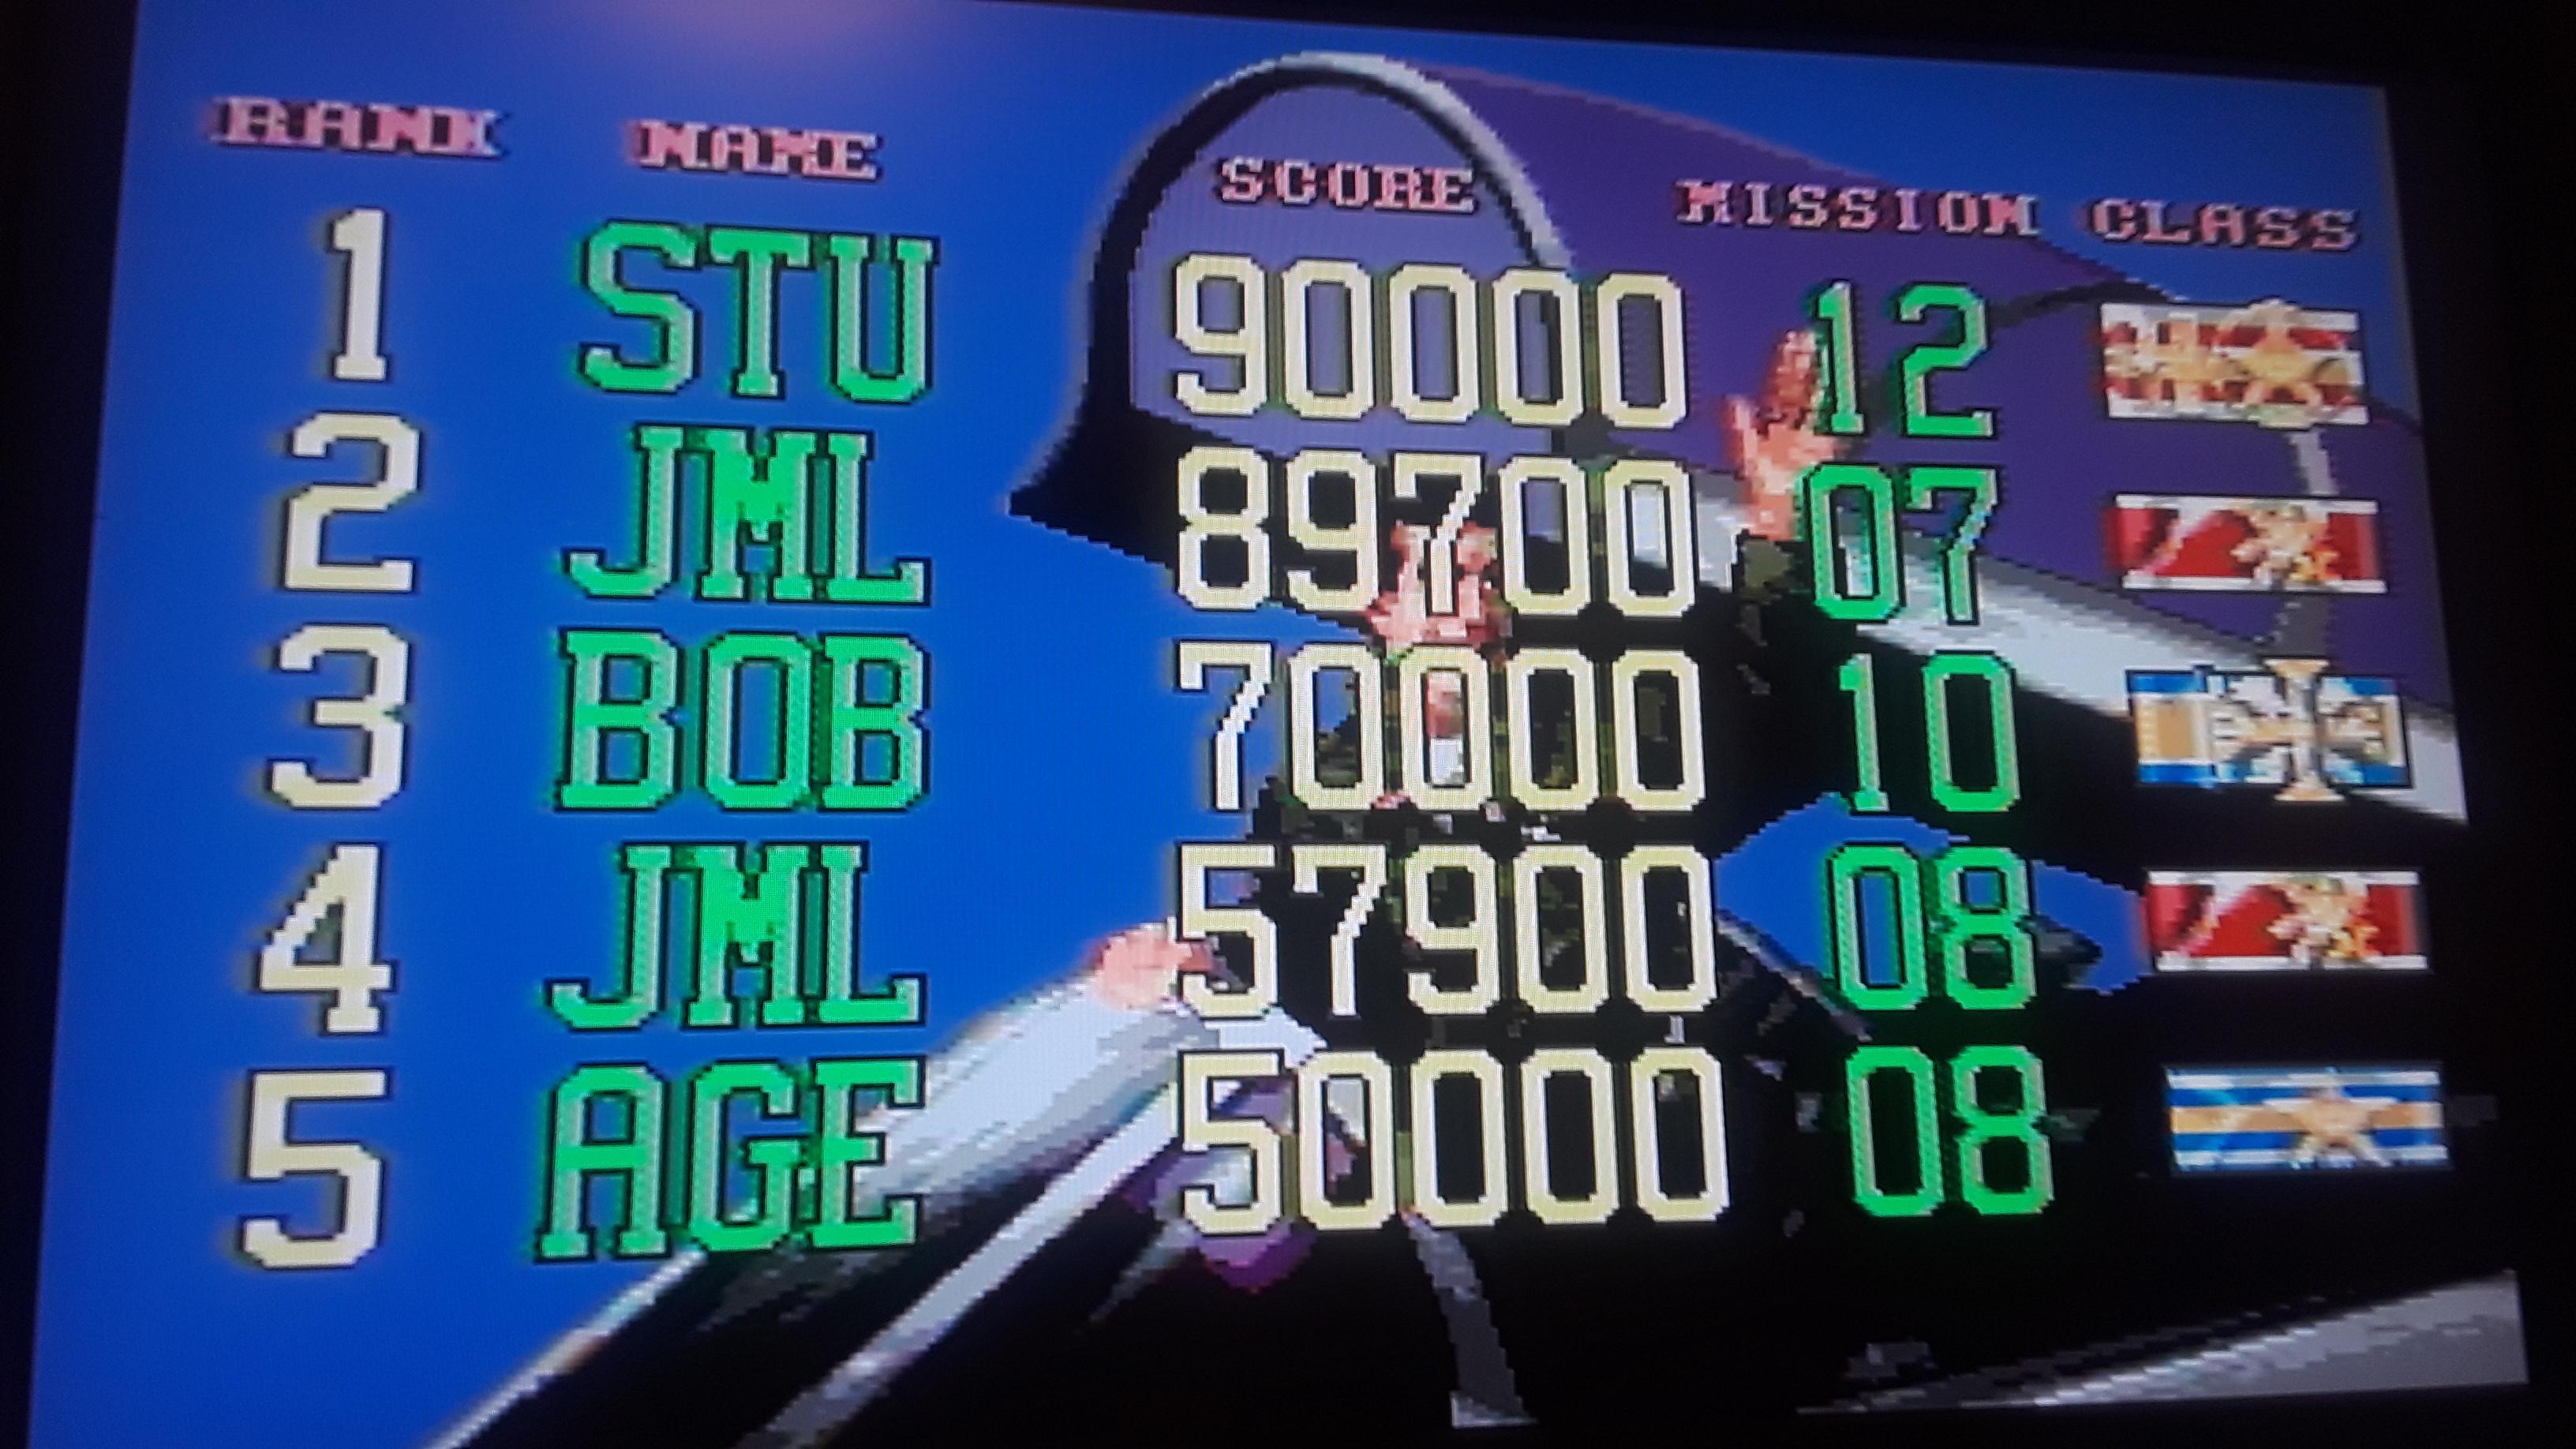 JML101582: G-LOC: Air Battle [Hard] (Sega Genesis / MegaDrive Emulated) 89,700 points on 2019-07-22 14:48:45